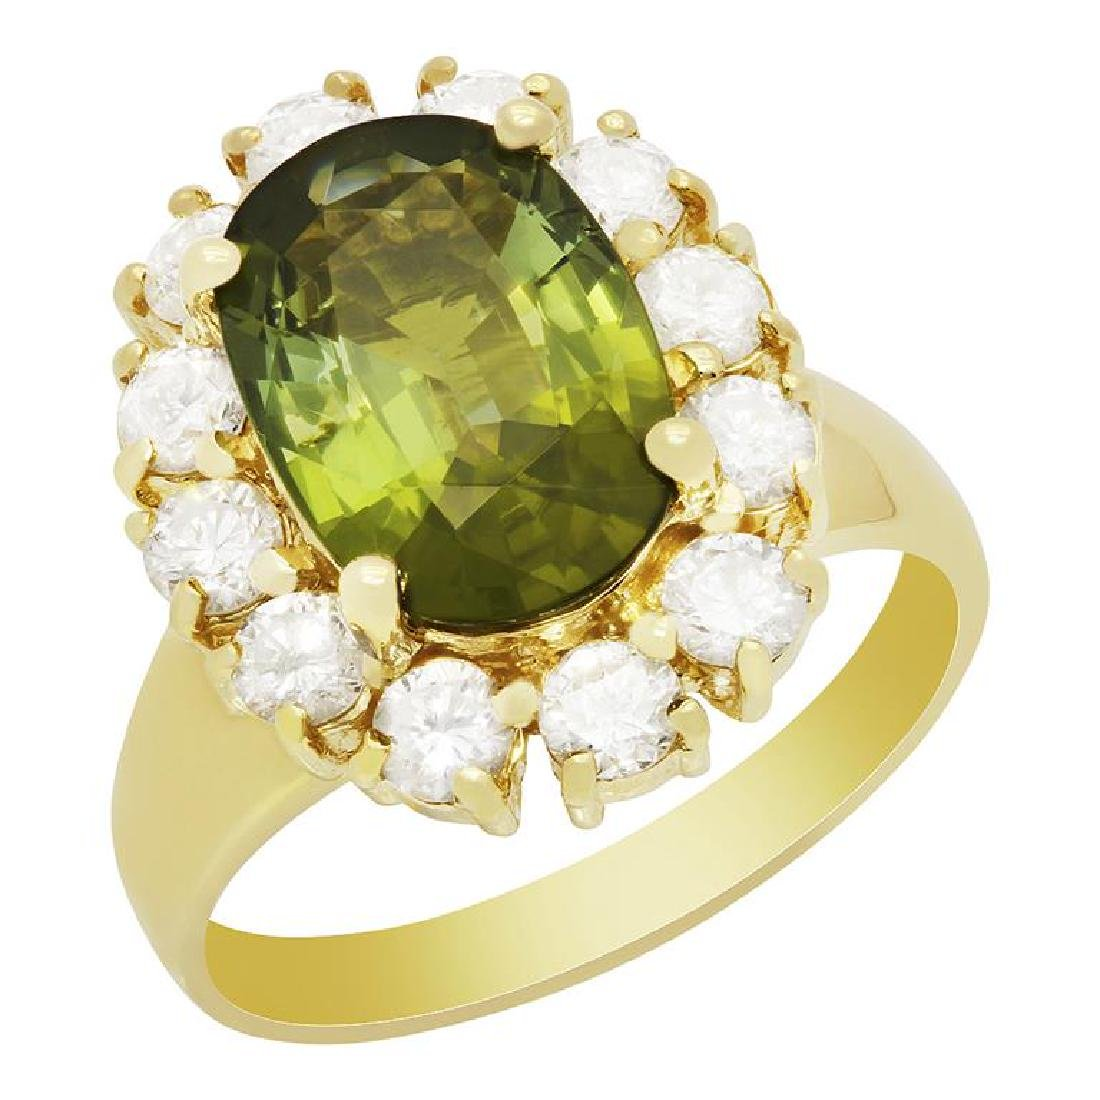 14k Yellow Gold 2.83ct Green Tourmaline 1.14ct Diamond